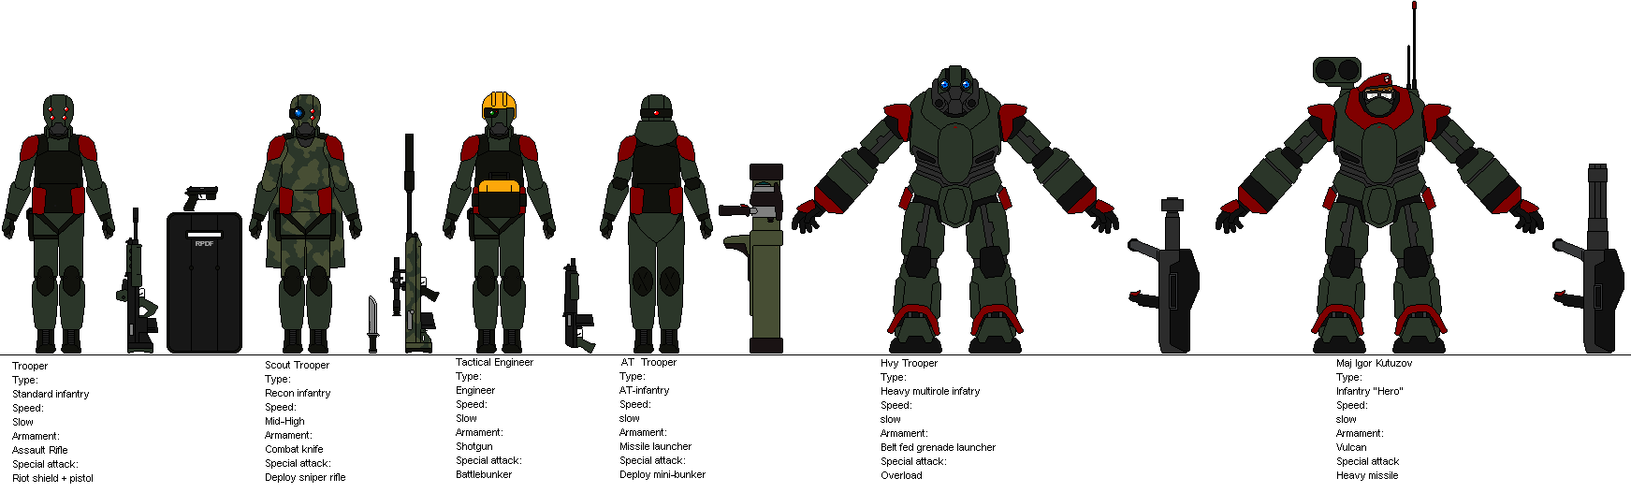 RPDF infantry concept RA3 MOD by IgorKutuzov